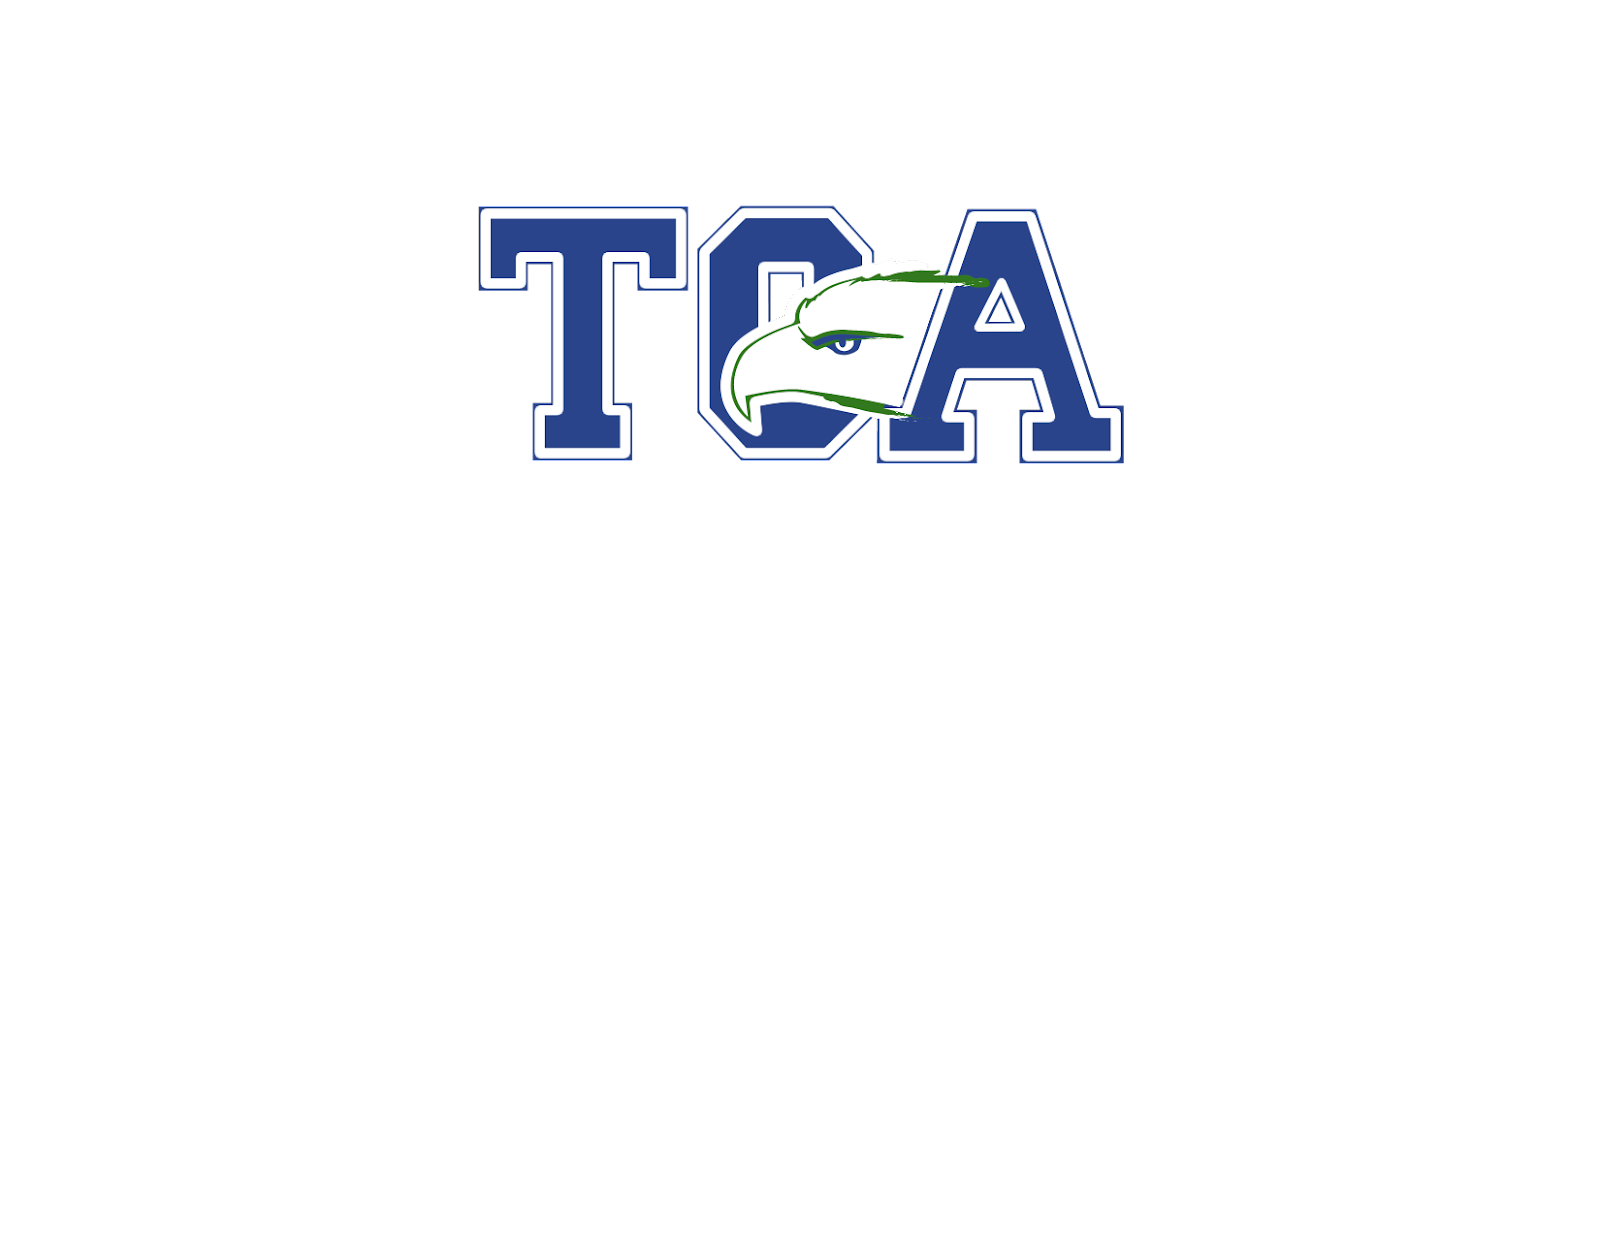 TCAeagleLogoHead.fw.png